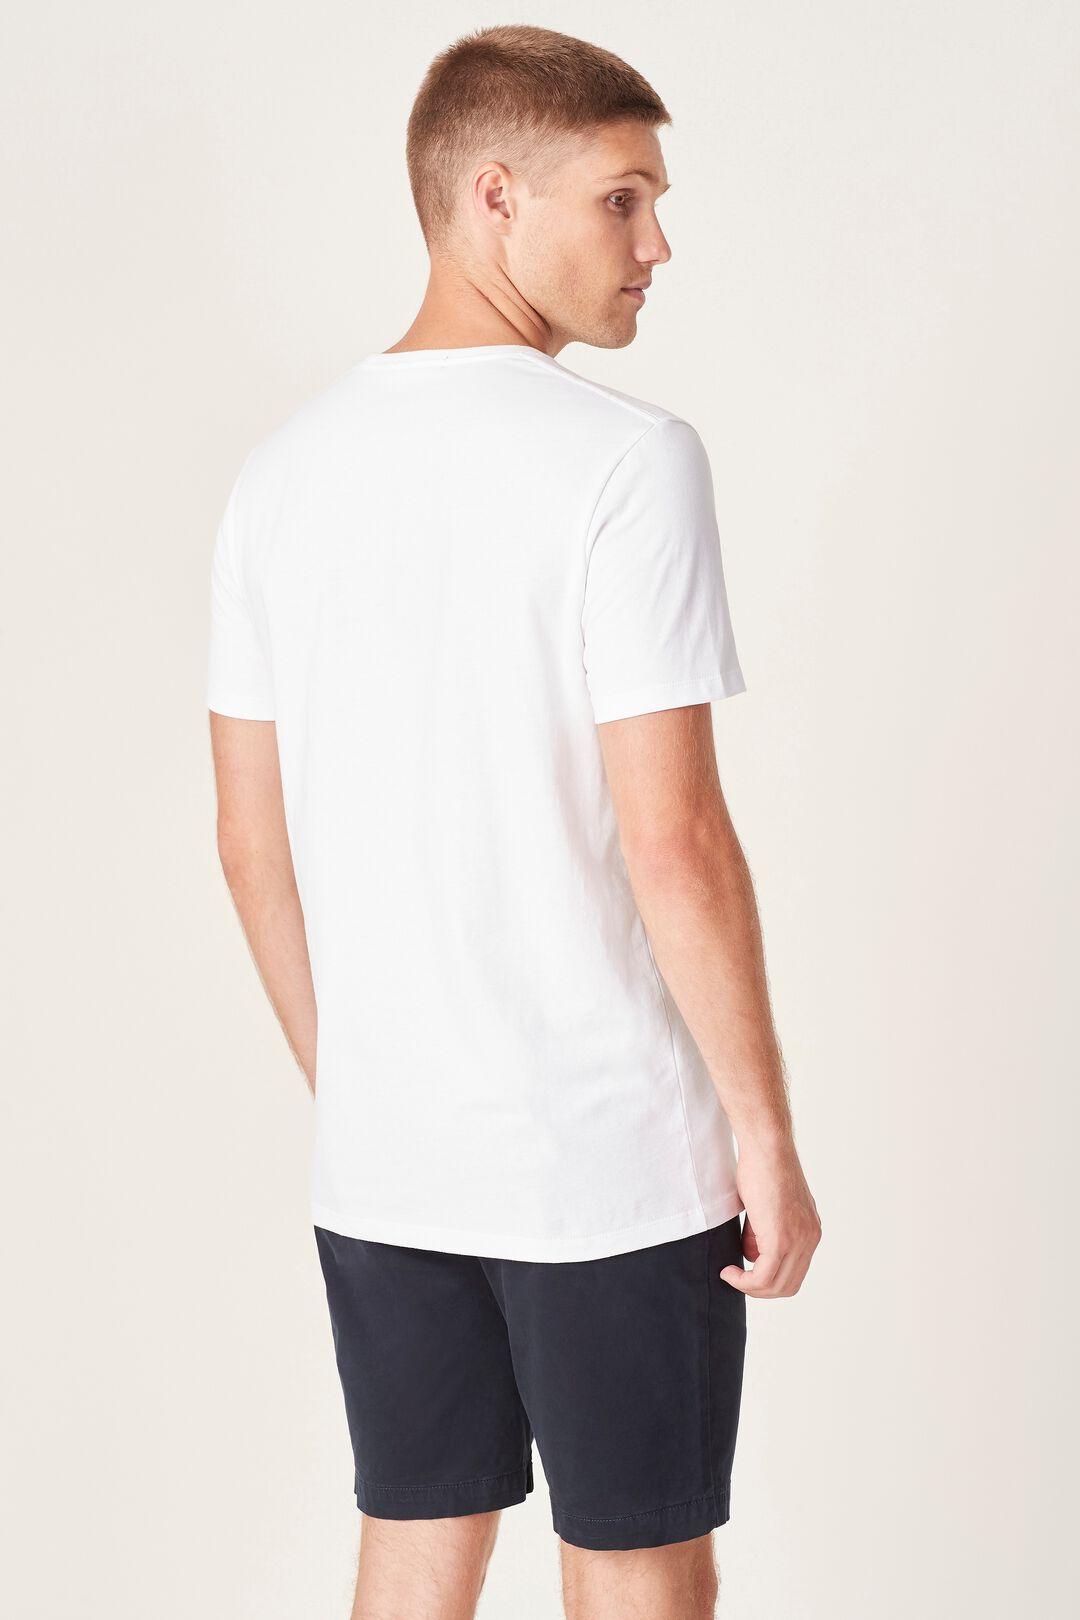 VINTAGE PALMS T-SHIRT  WHITE  hi-res